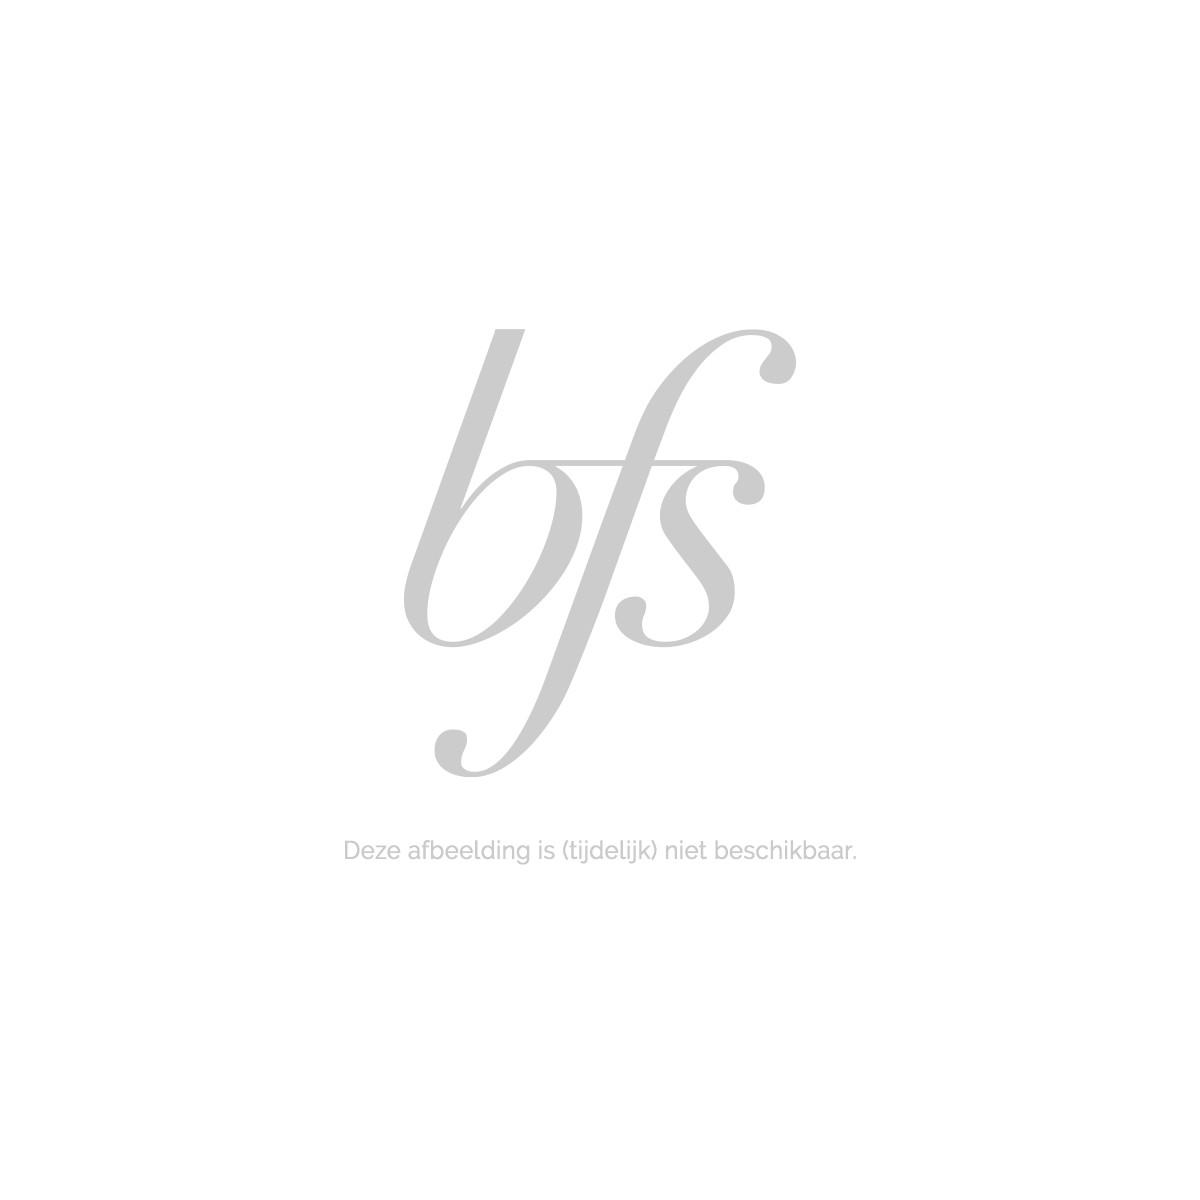 Bema Beauty Products Autumn Gift